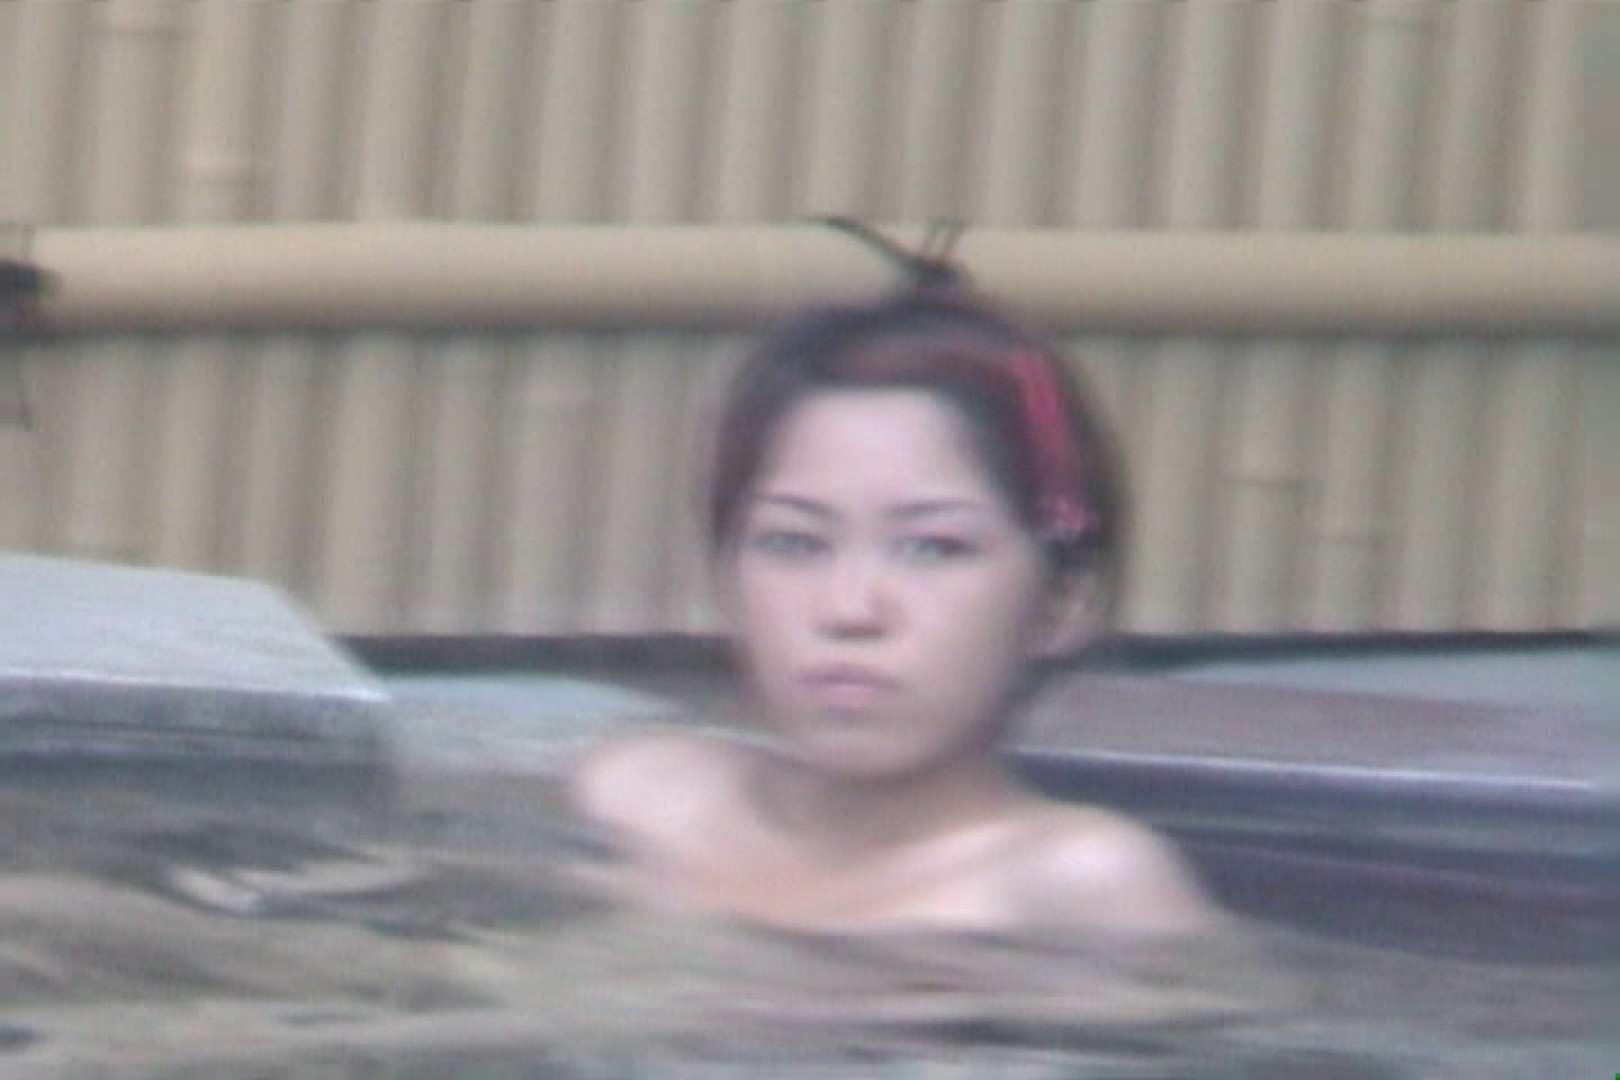 Aquaな露天風呂Vol.574 綺麗なOLたち オマンコ無修正動画無料 88枚 50